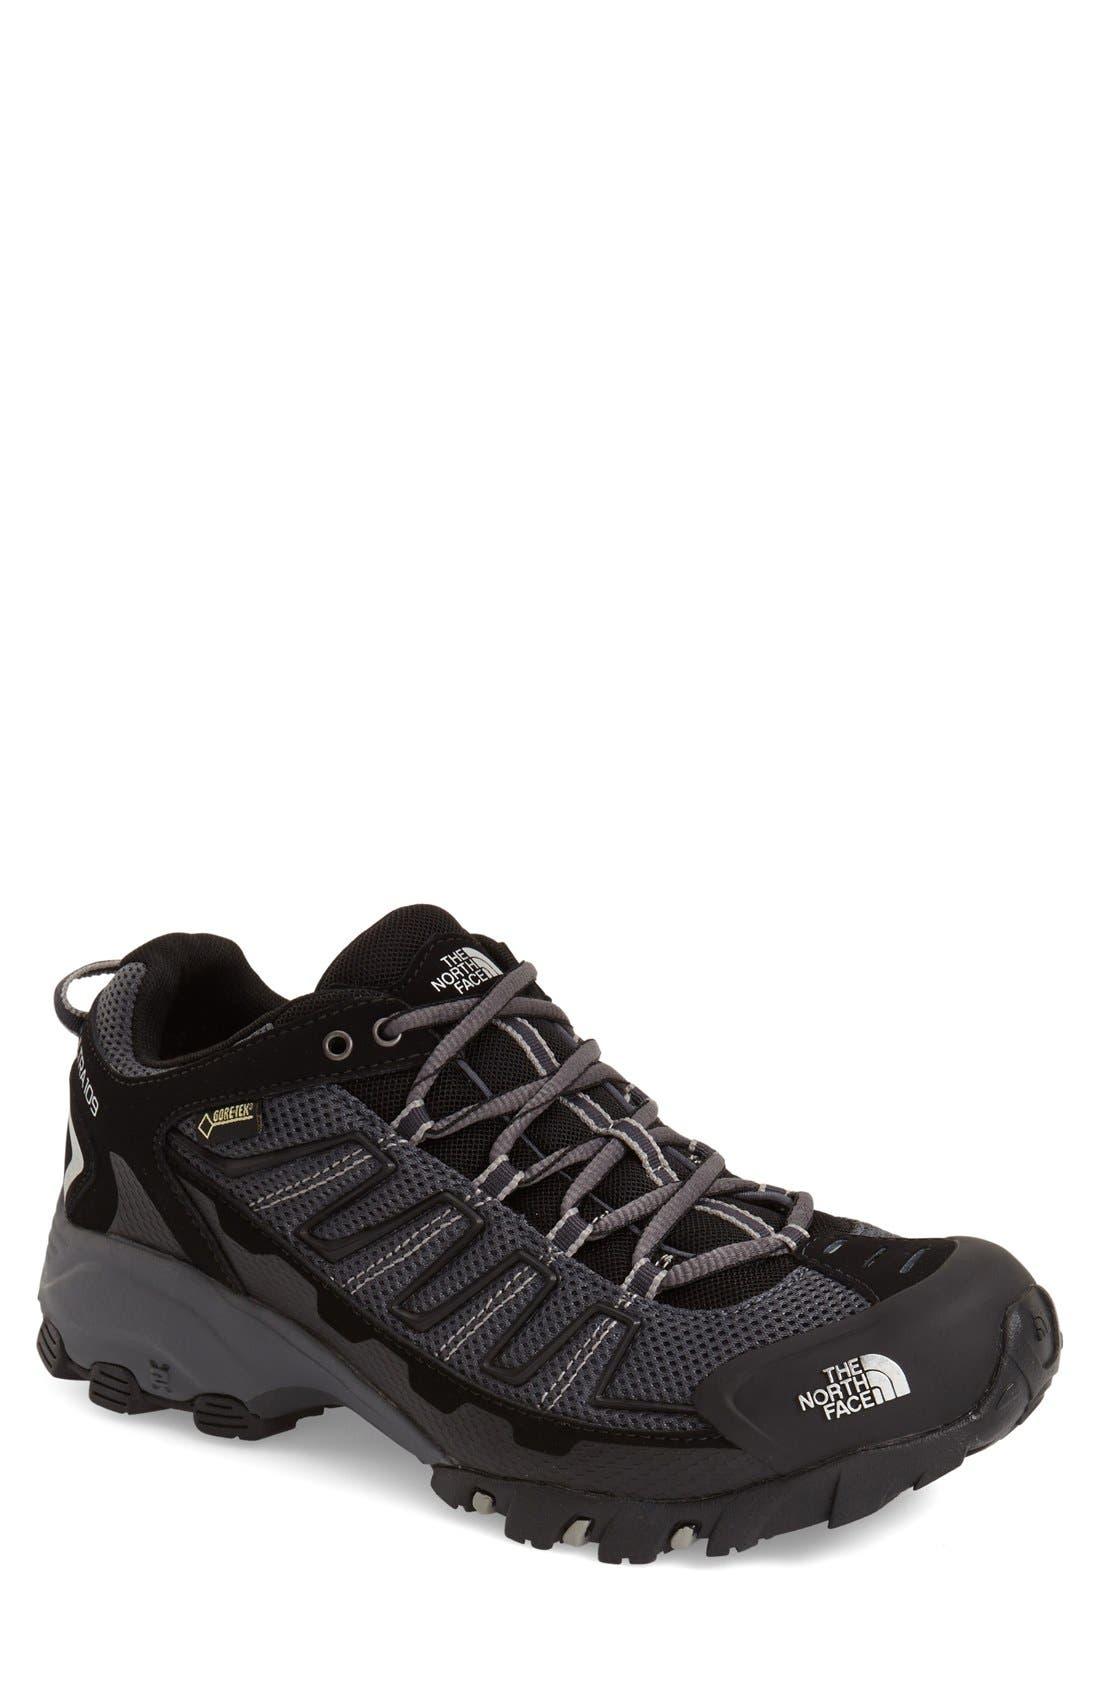 'Ultra 109 GTX' Waterproof Running Shoe,                             Main thumbnail 1, color,                             Black/ Dark Shadow Grey